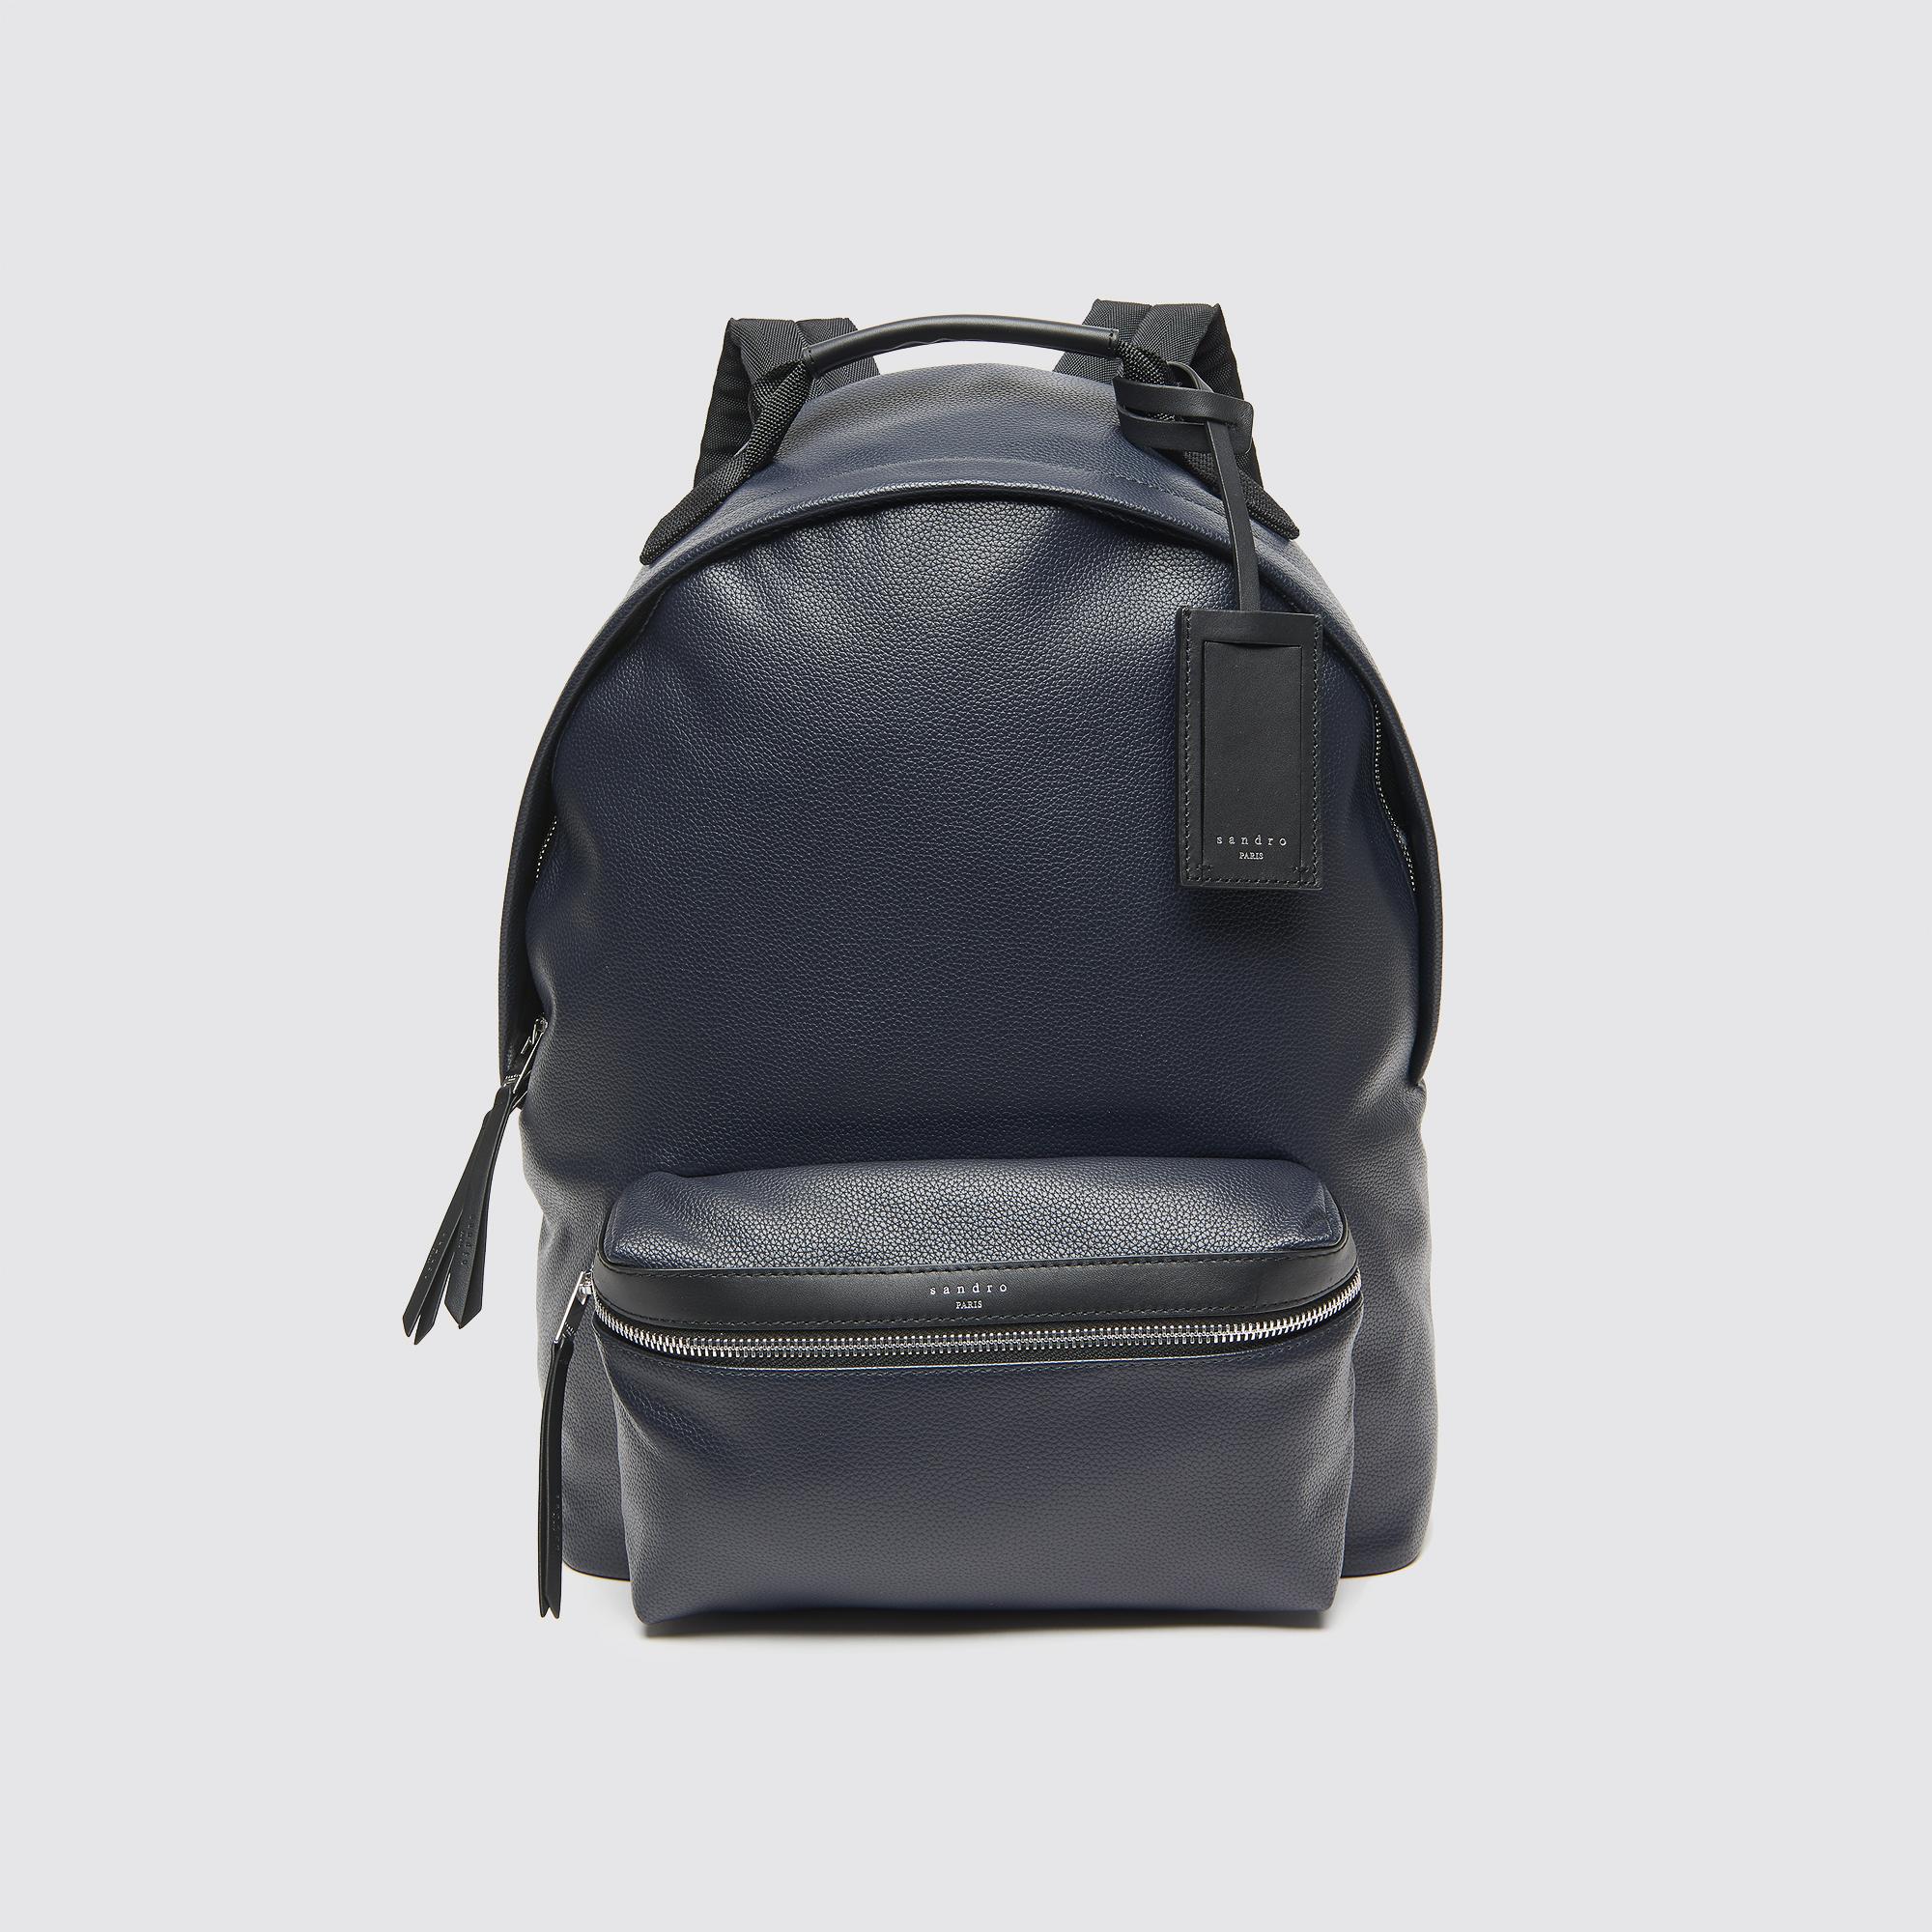 sac dos toile enduite 3607171287109 sacs dos. Black Bedroom Furniture Sets. Home Design Ideas